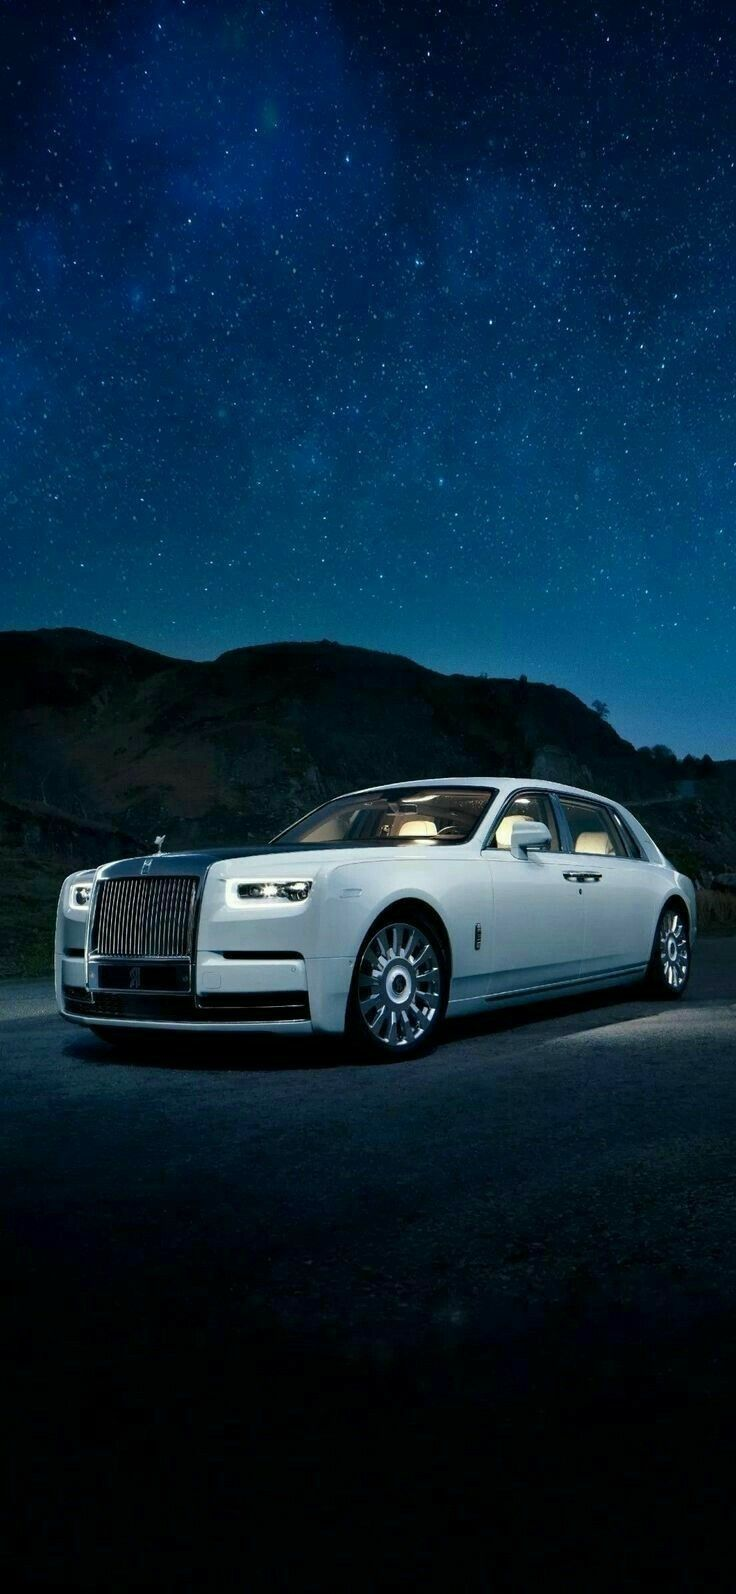 Bentley Luxury Car Hd Wallpaper Rolls Royce Rolls Royce Wallpaper Luxury Cars